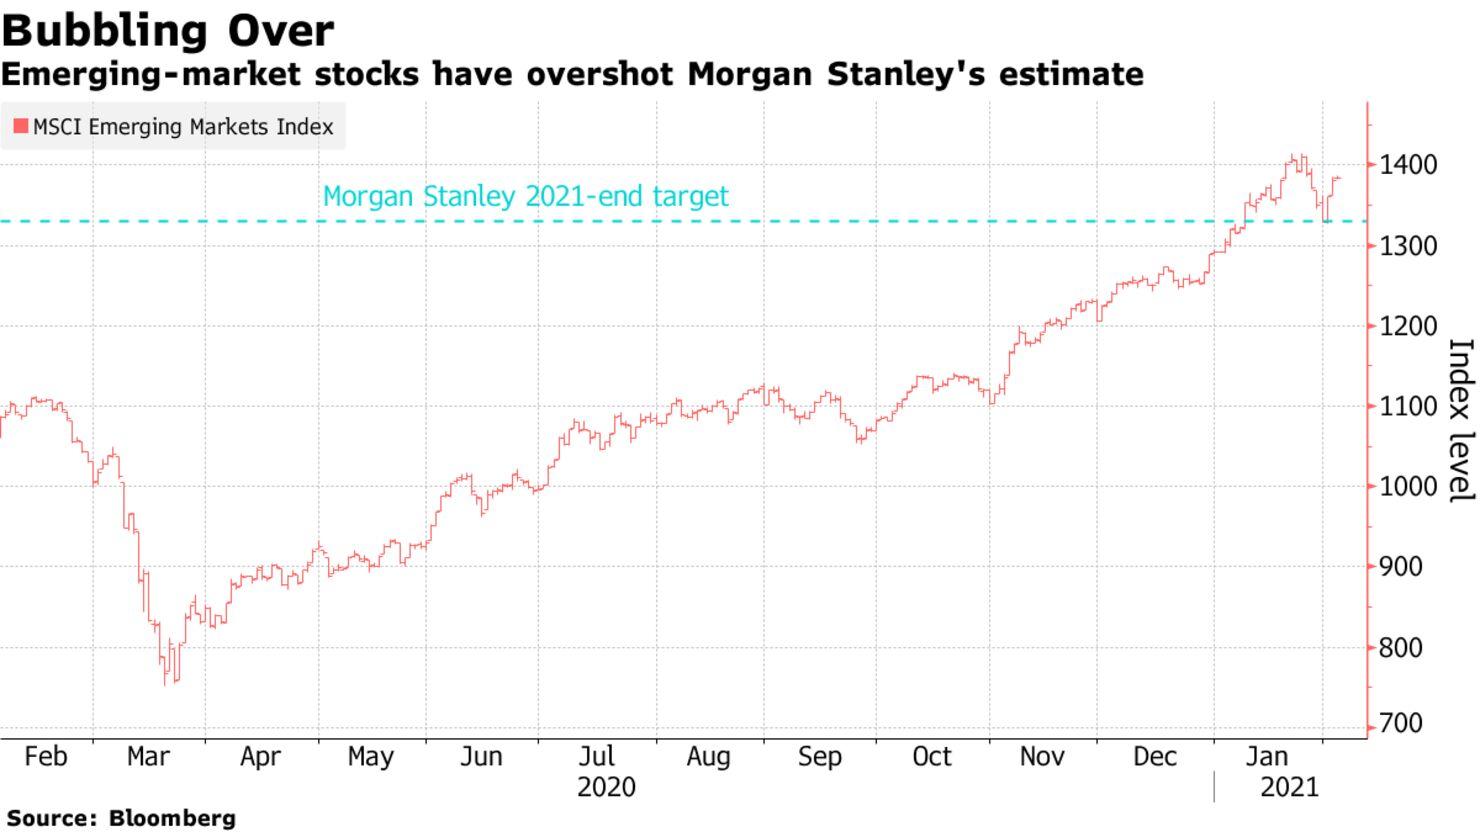 Emerging-market stocks have overshot Morgan Stanley's estimate